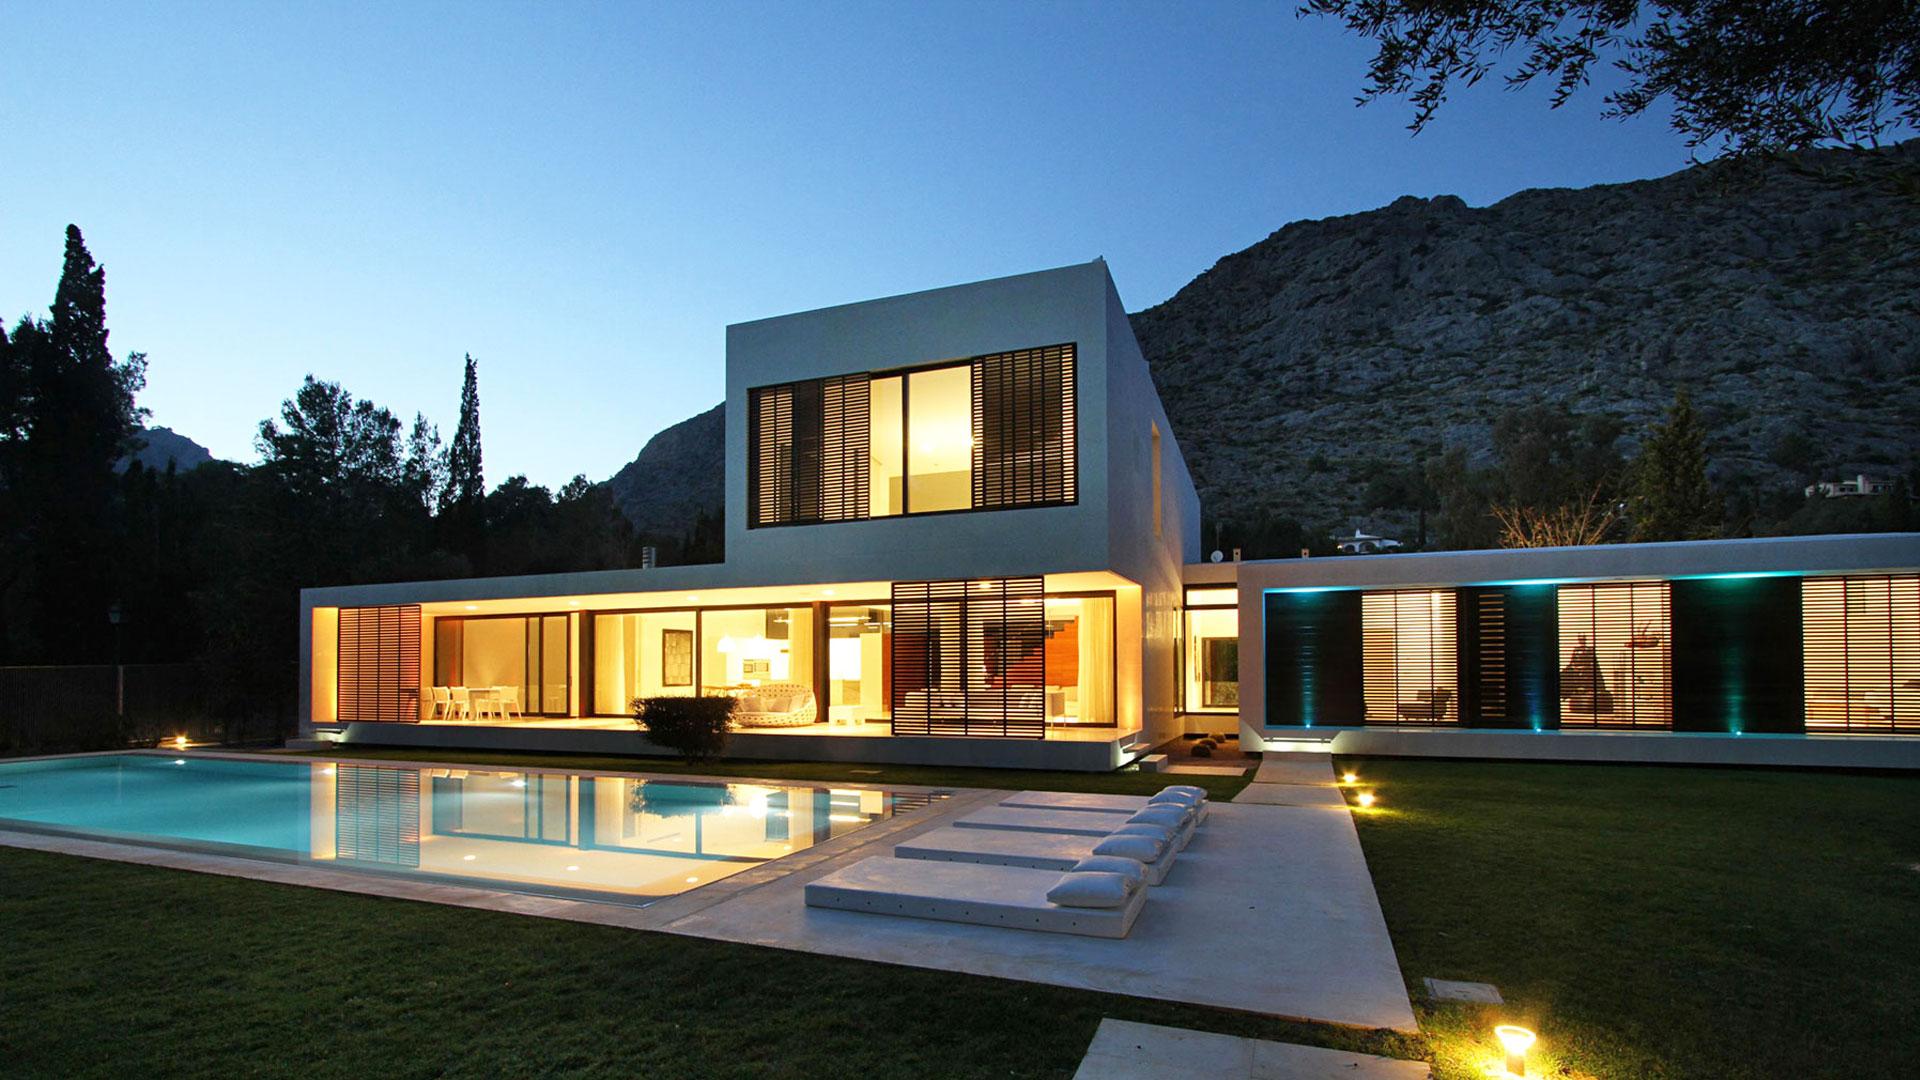 konzept villa alanya slv12 turquoise immobilien t rkei alanya. Black Bedroom Furniture Sets. Home Design Ideas